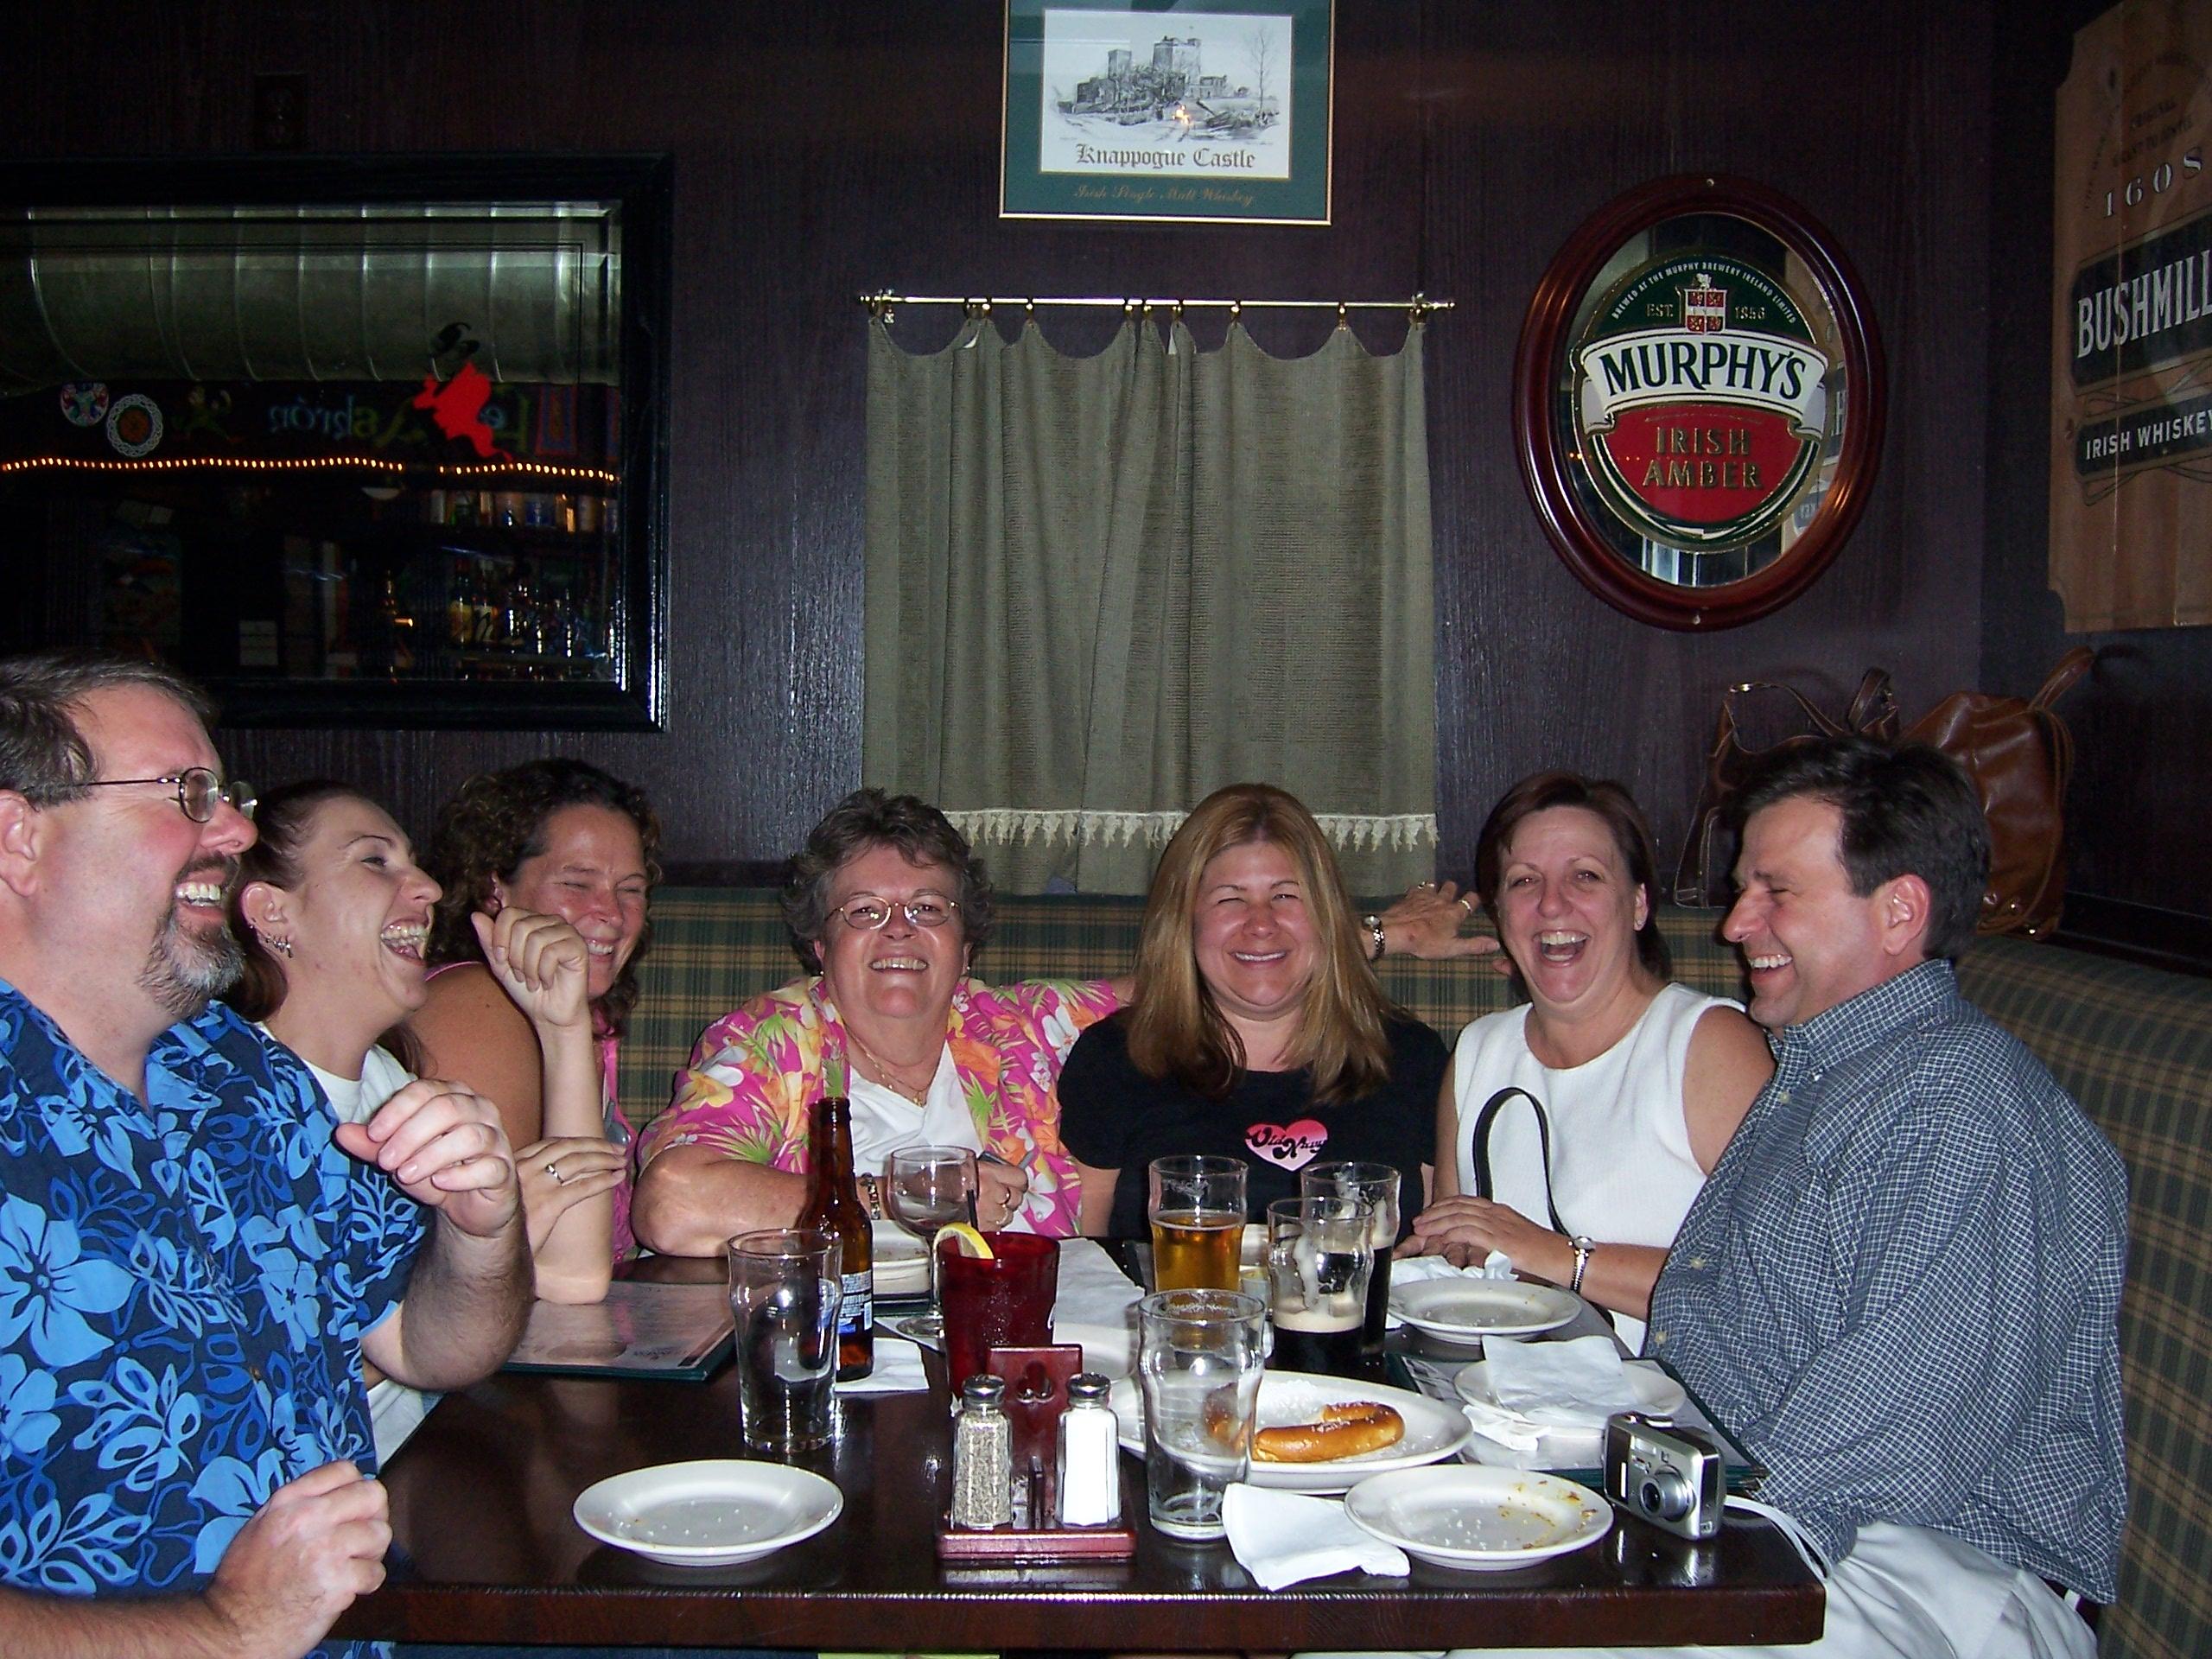 Robbins & Curtin Staff Celebrating at Rosie McCaffrey's, 2005.